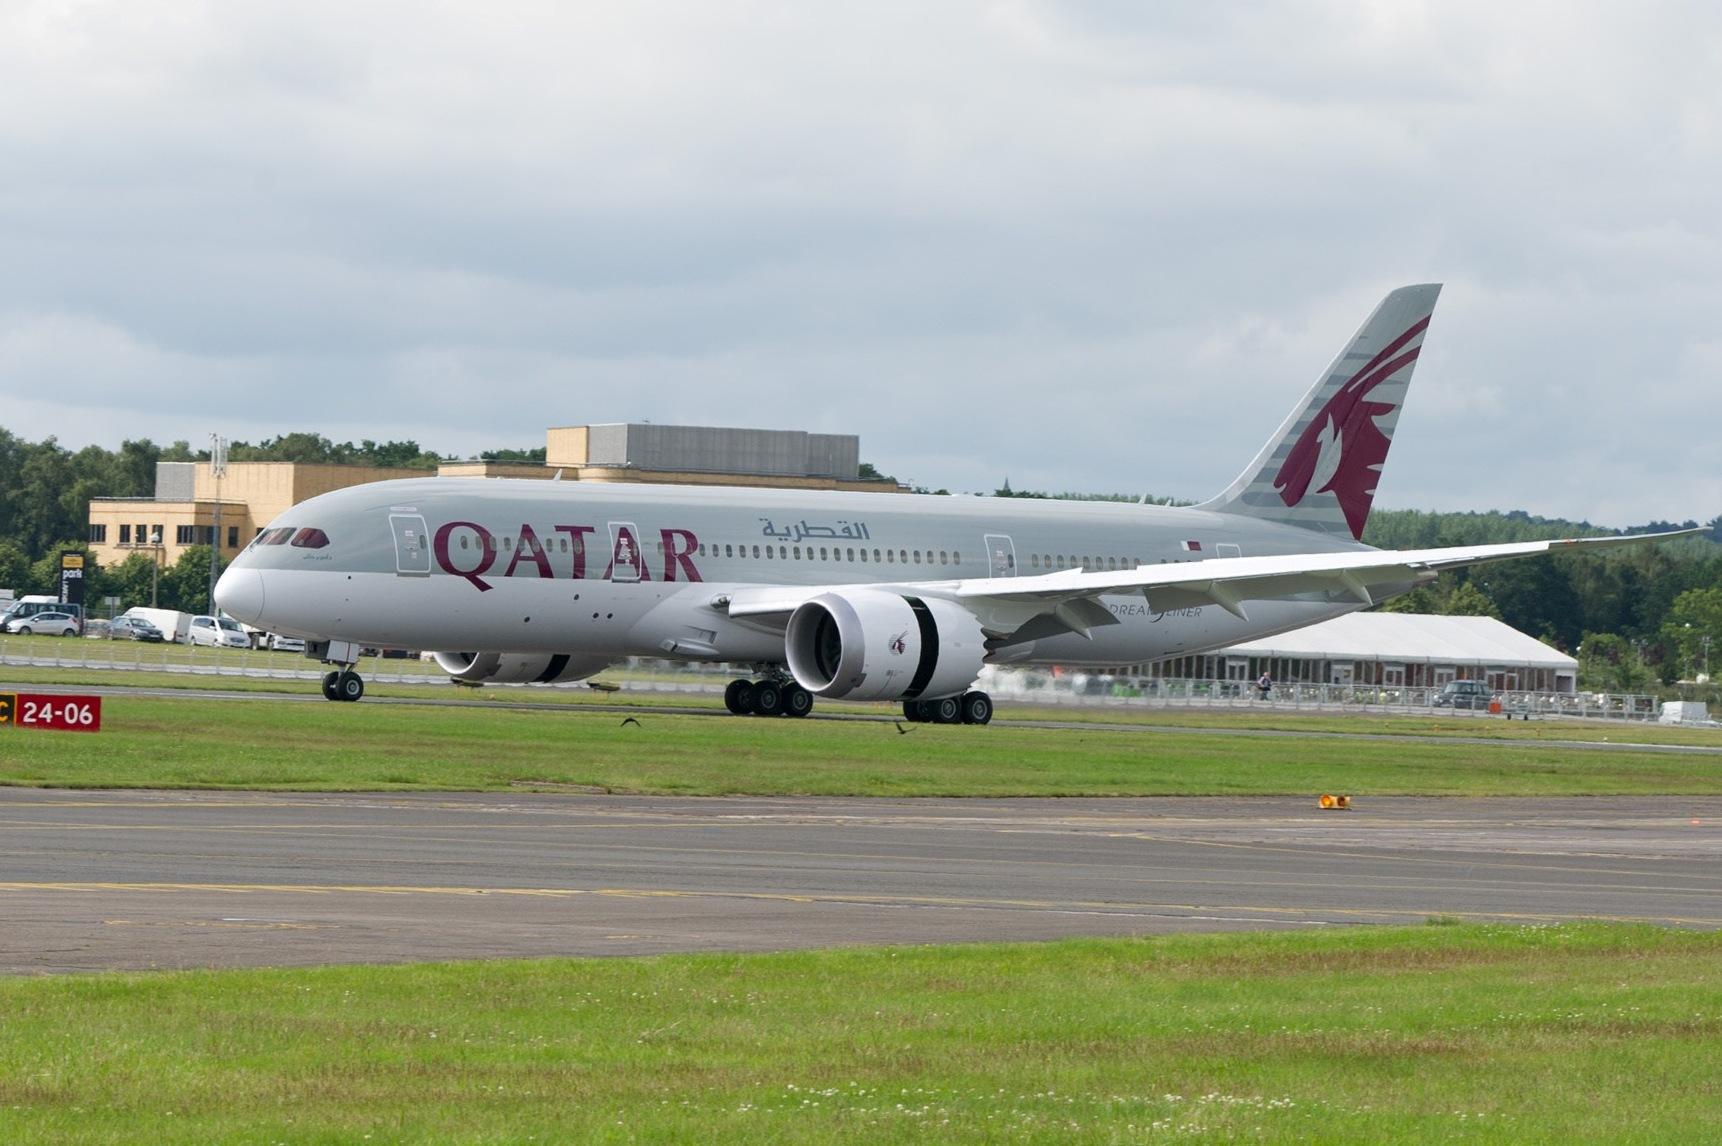 katar davit na parij v nadejde poluchit bolshe aviareisov Катар давит на Париж в надежде получить больше авиарейсов